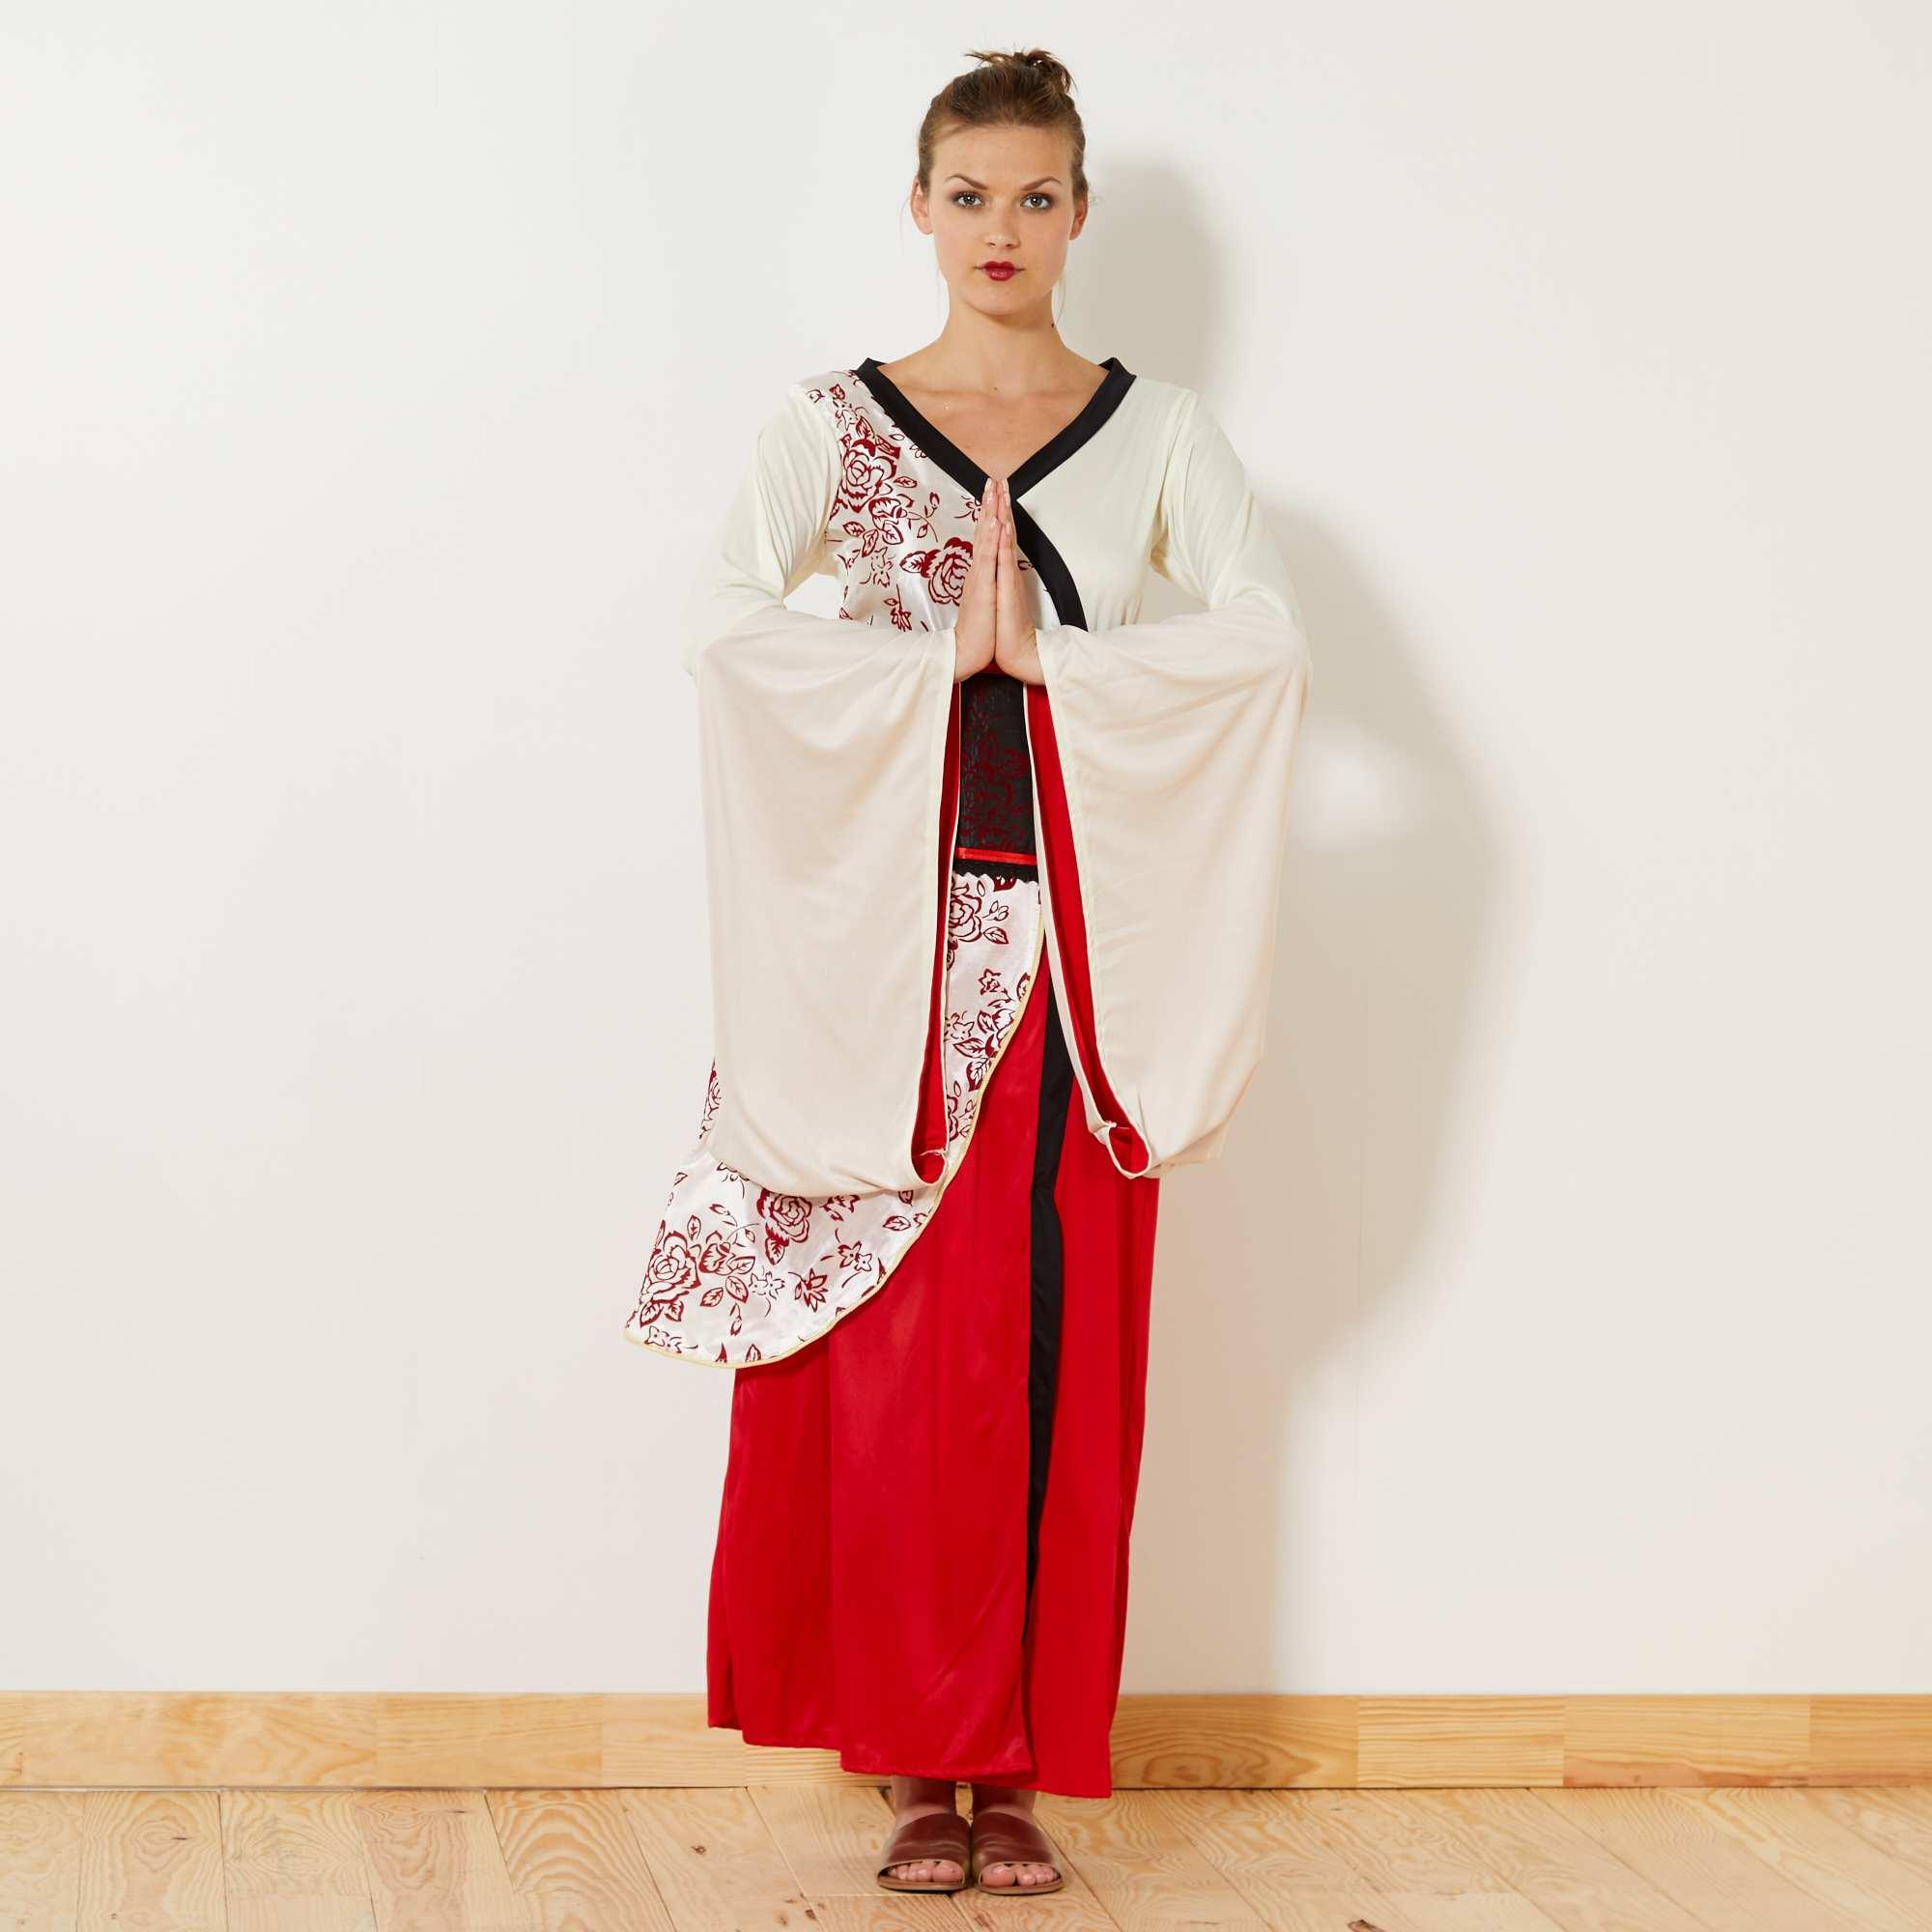 Banques de photographies de filles, geisha - bas, marche